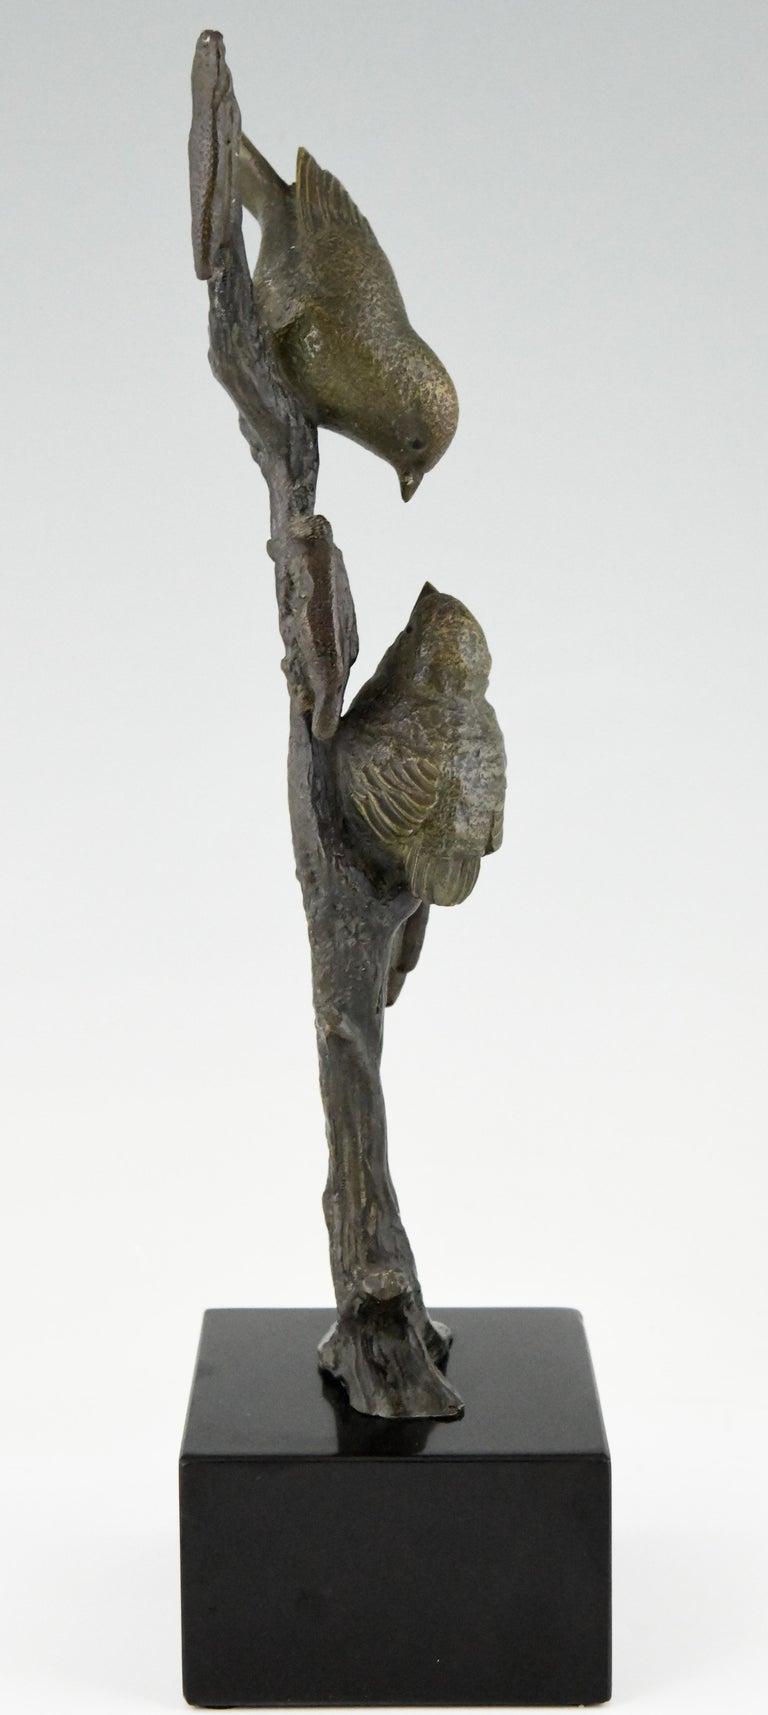 Art Deco Bronze Sculpture Two Birds on an Branch Irenee Rochard, France, 1930 For Sale 2